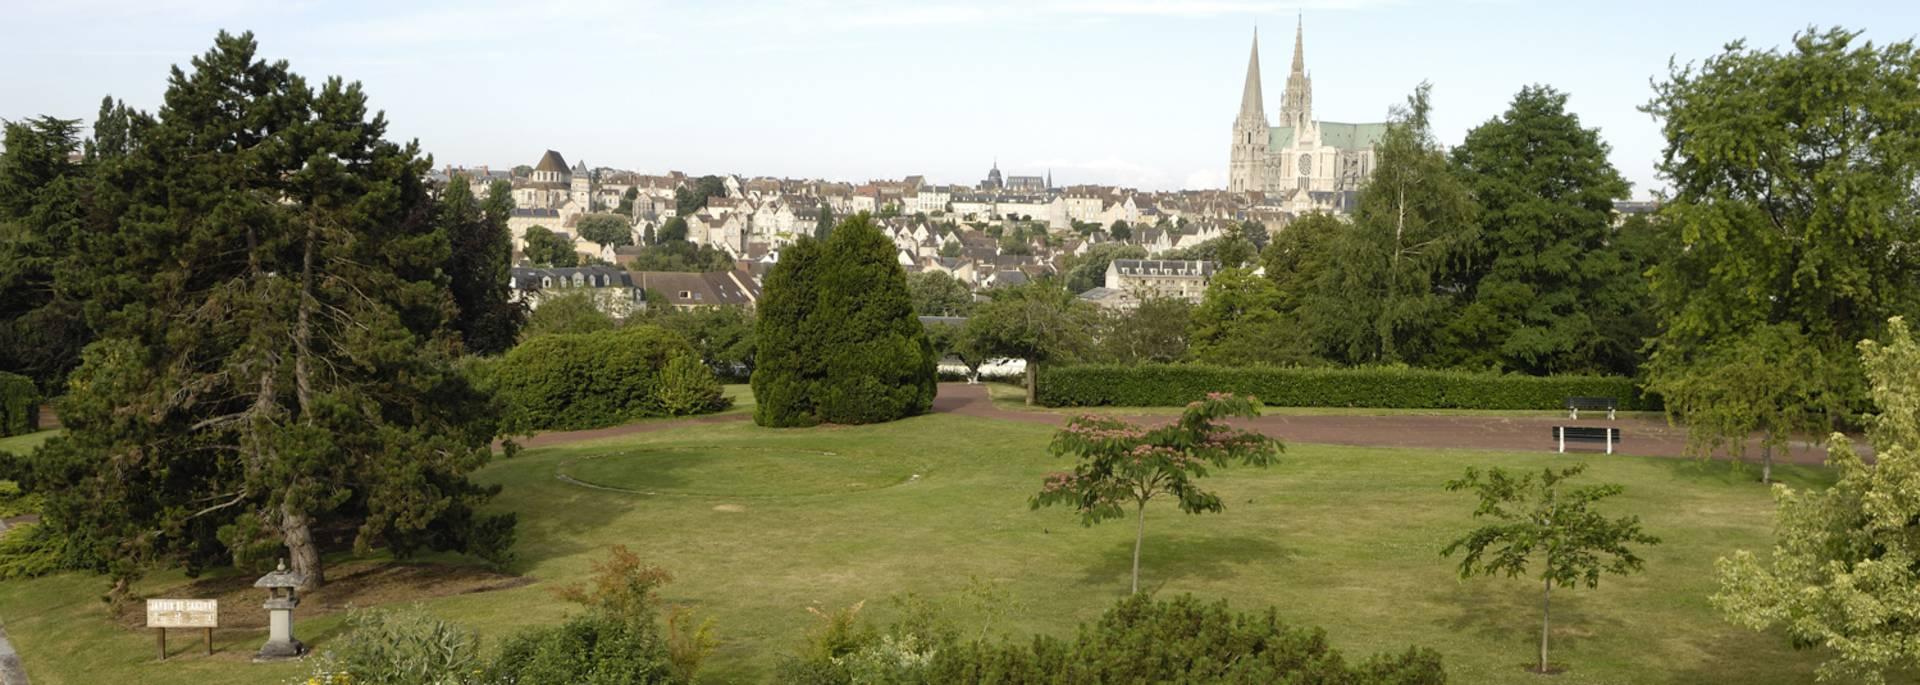 © C'Chartres Tourisme - Ville de Chartres - Guillermo Osorio